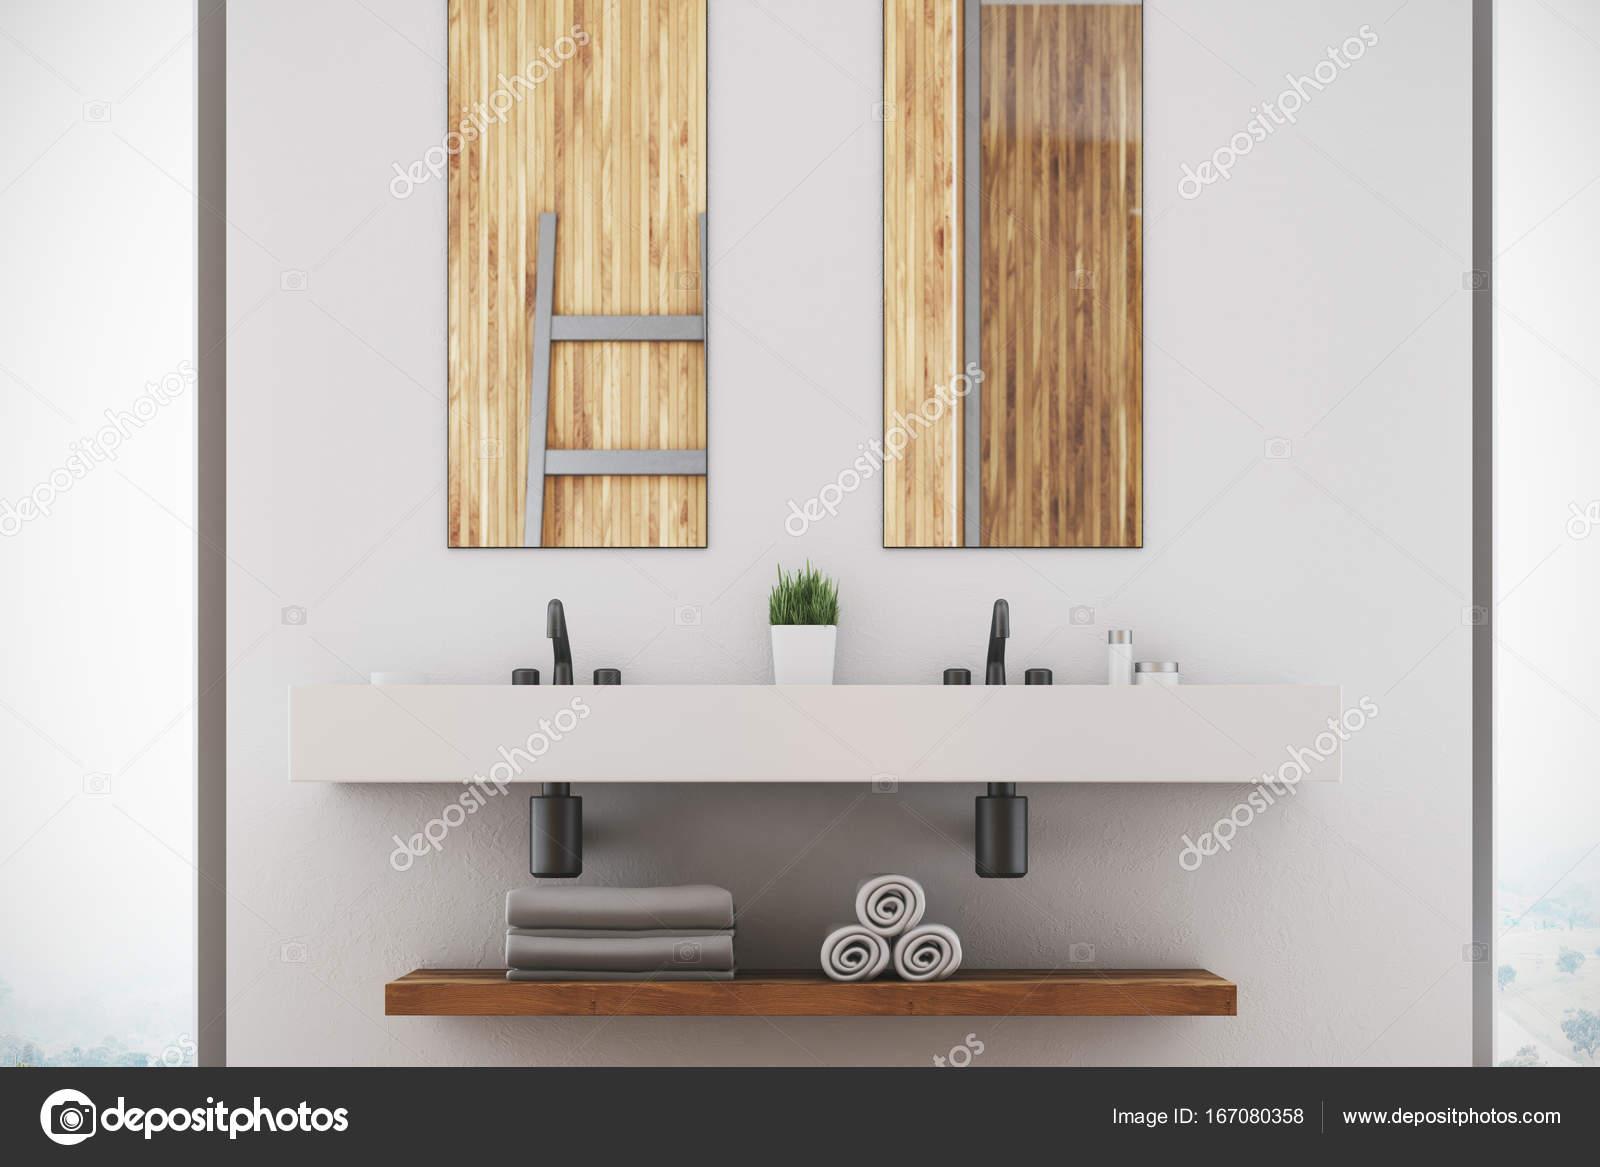 https://st3.depositphotos.com/2673929/16708/i/1600/depositphotos_167080358-stockafbeelding-witte-badkamer-dubbele-wastafel-spiegels.jpg